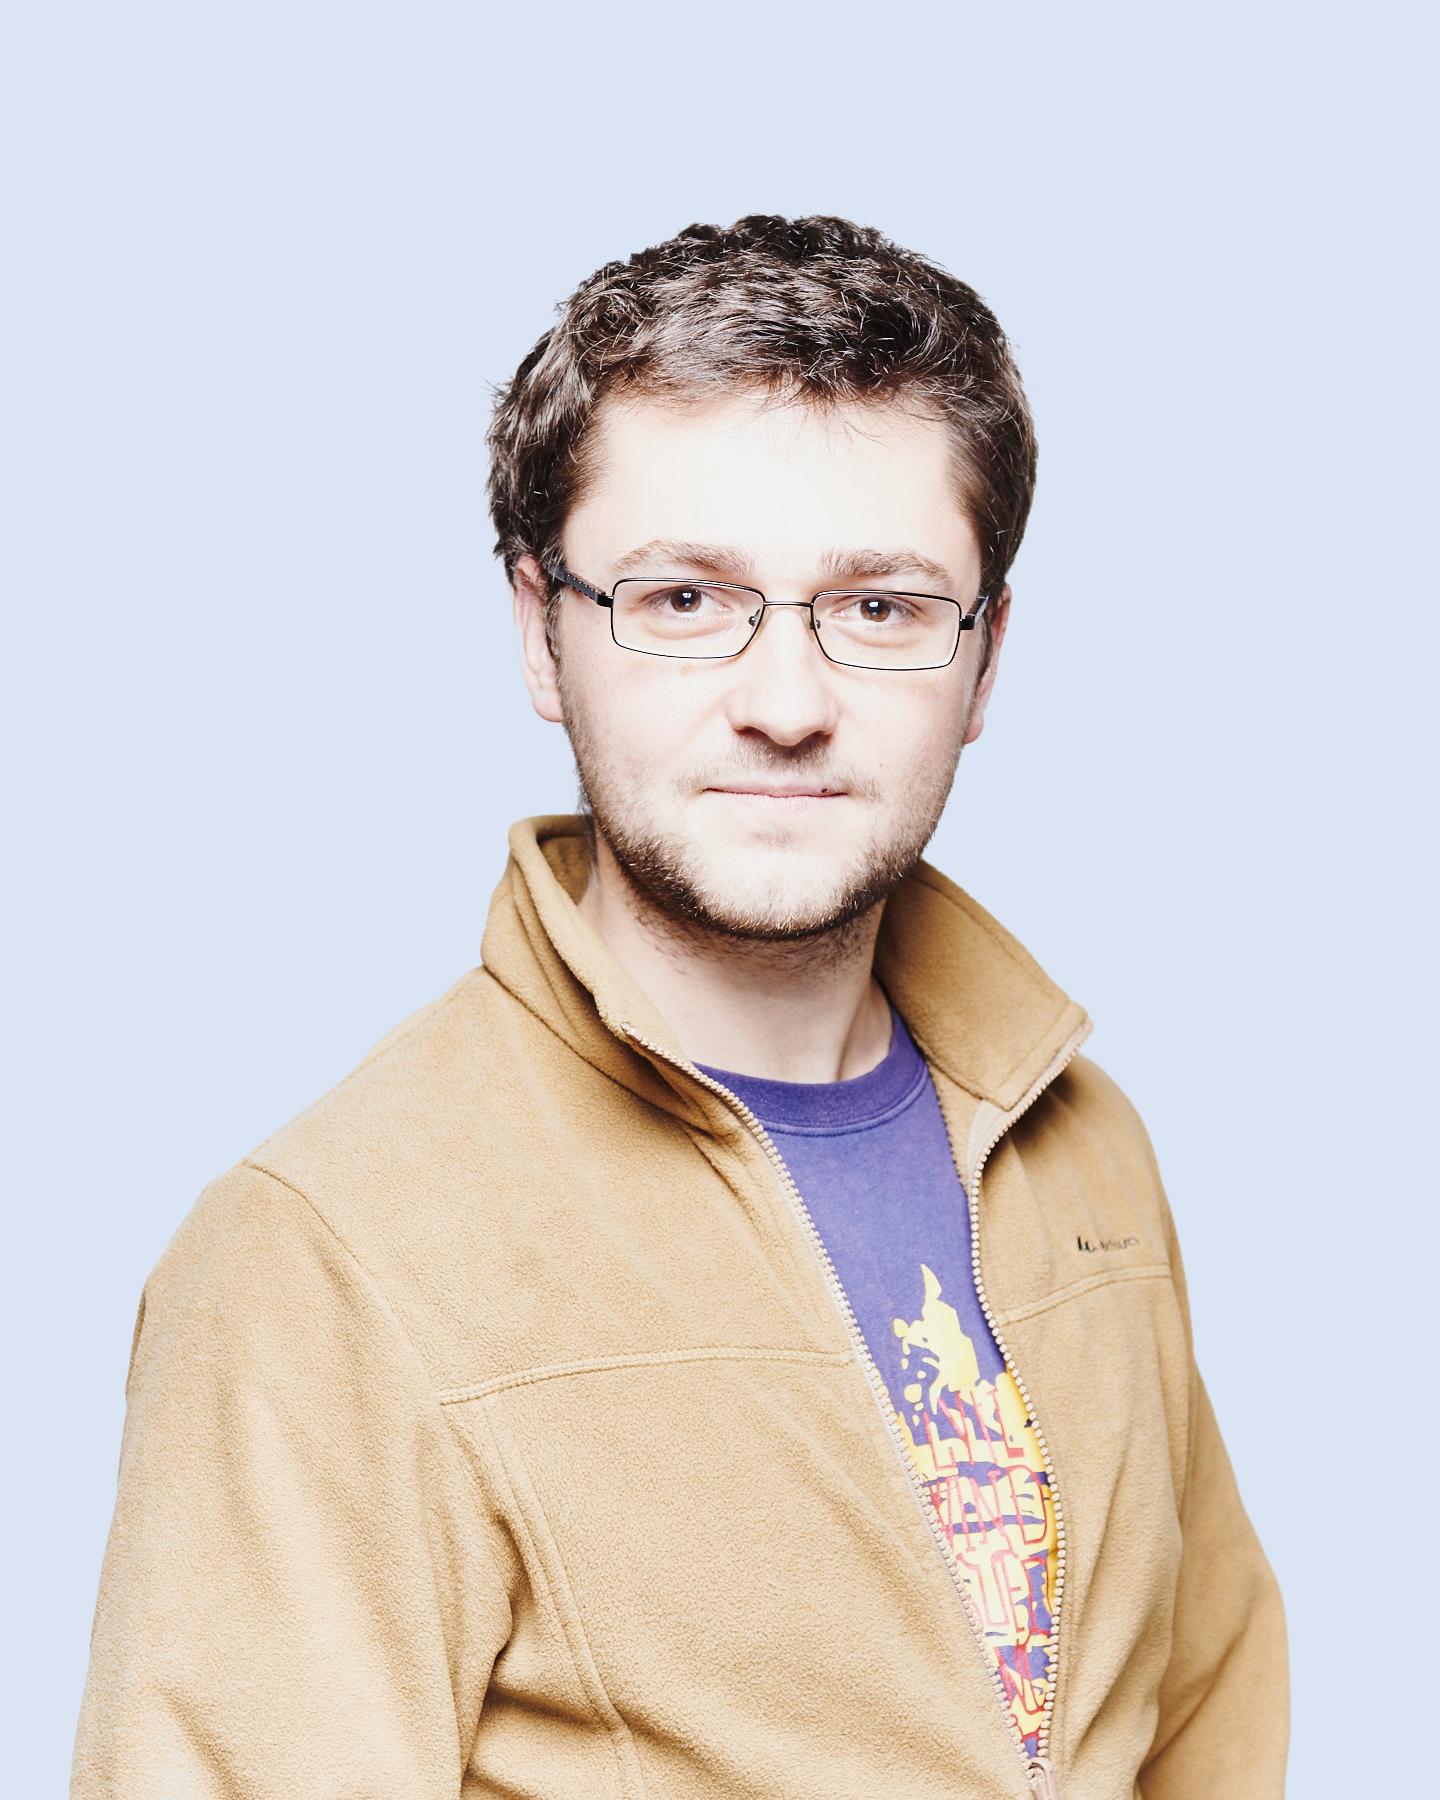 Vlad Radulescu